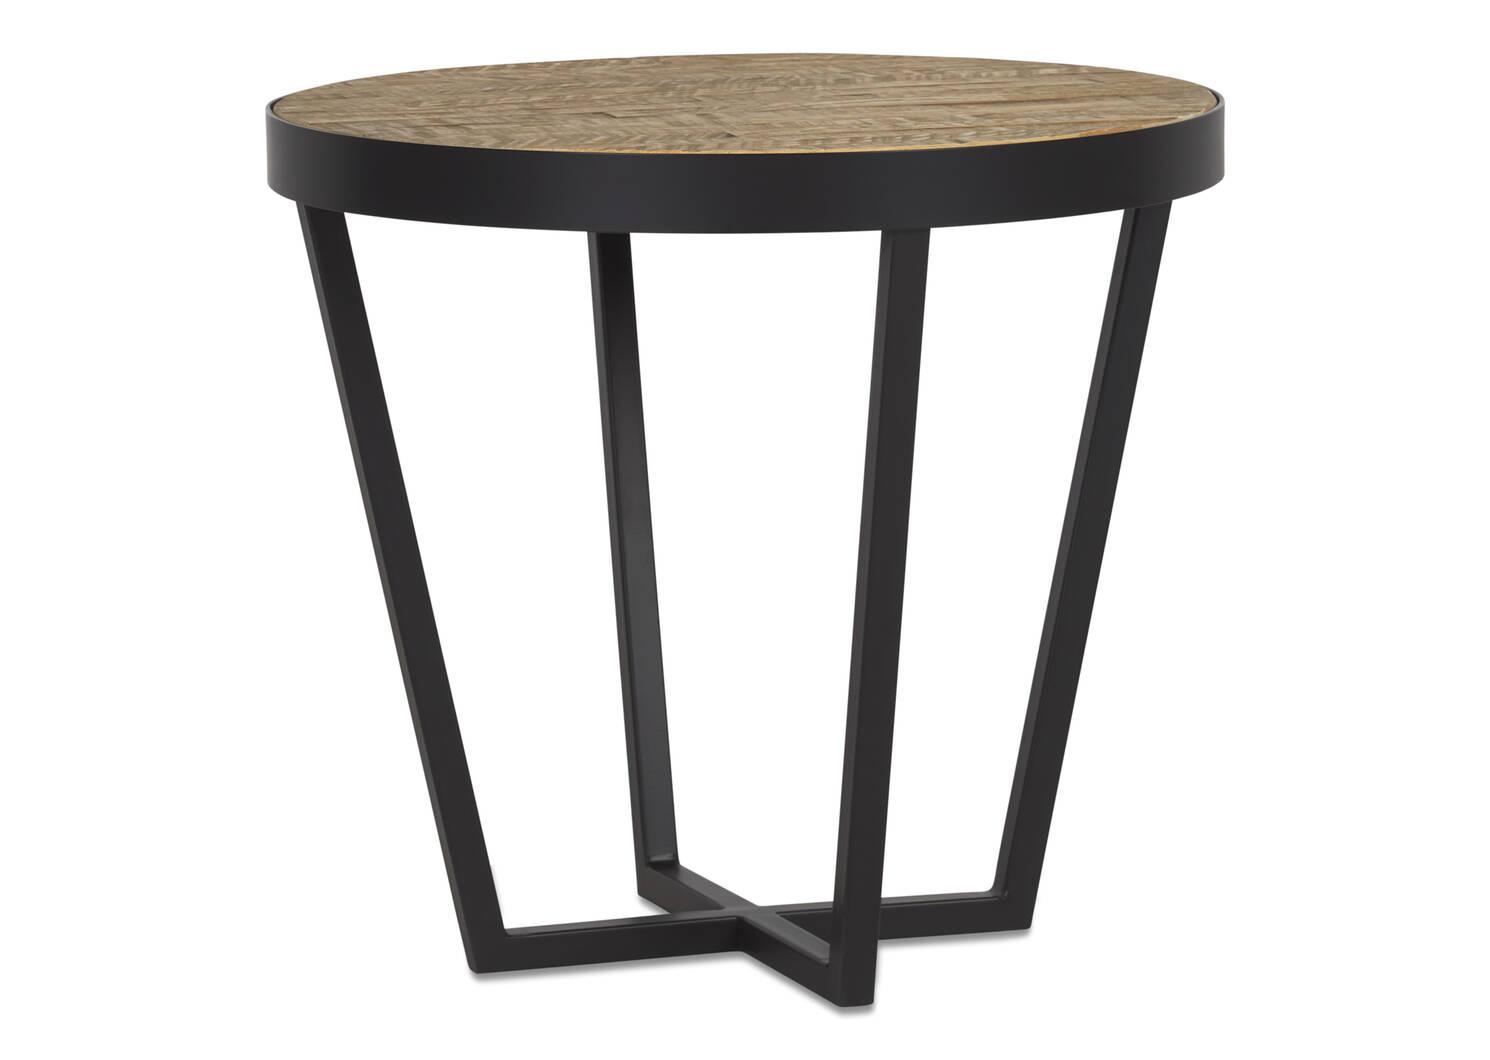 Table d'appoint Orsen -Aspen chêne